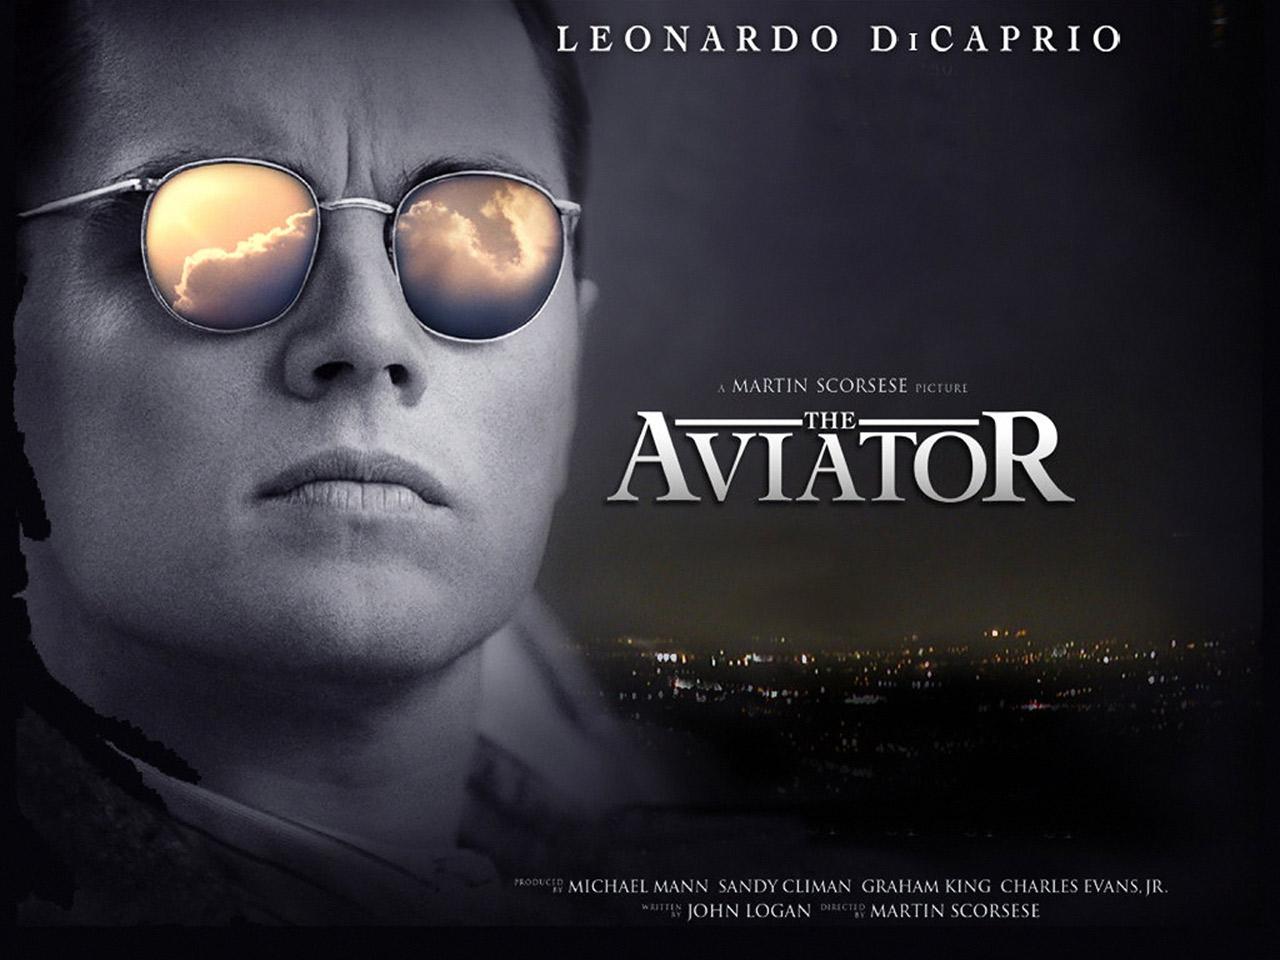 http://1.bp.blogspot.com/-cz2ETFwq7vc/UQmuAG9kHTI/AAAAAAAAvaQ/BhDZA2MwFCA/s1600/leonardo-dicaprio-aviator-poster.jpg